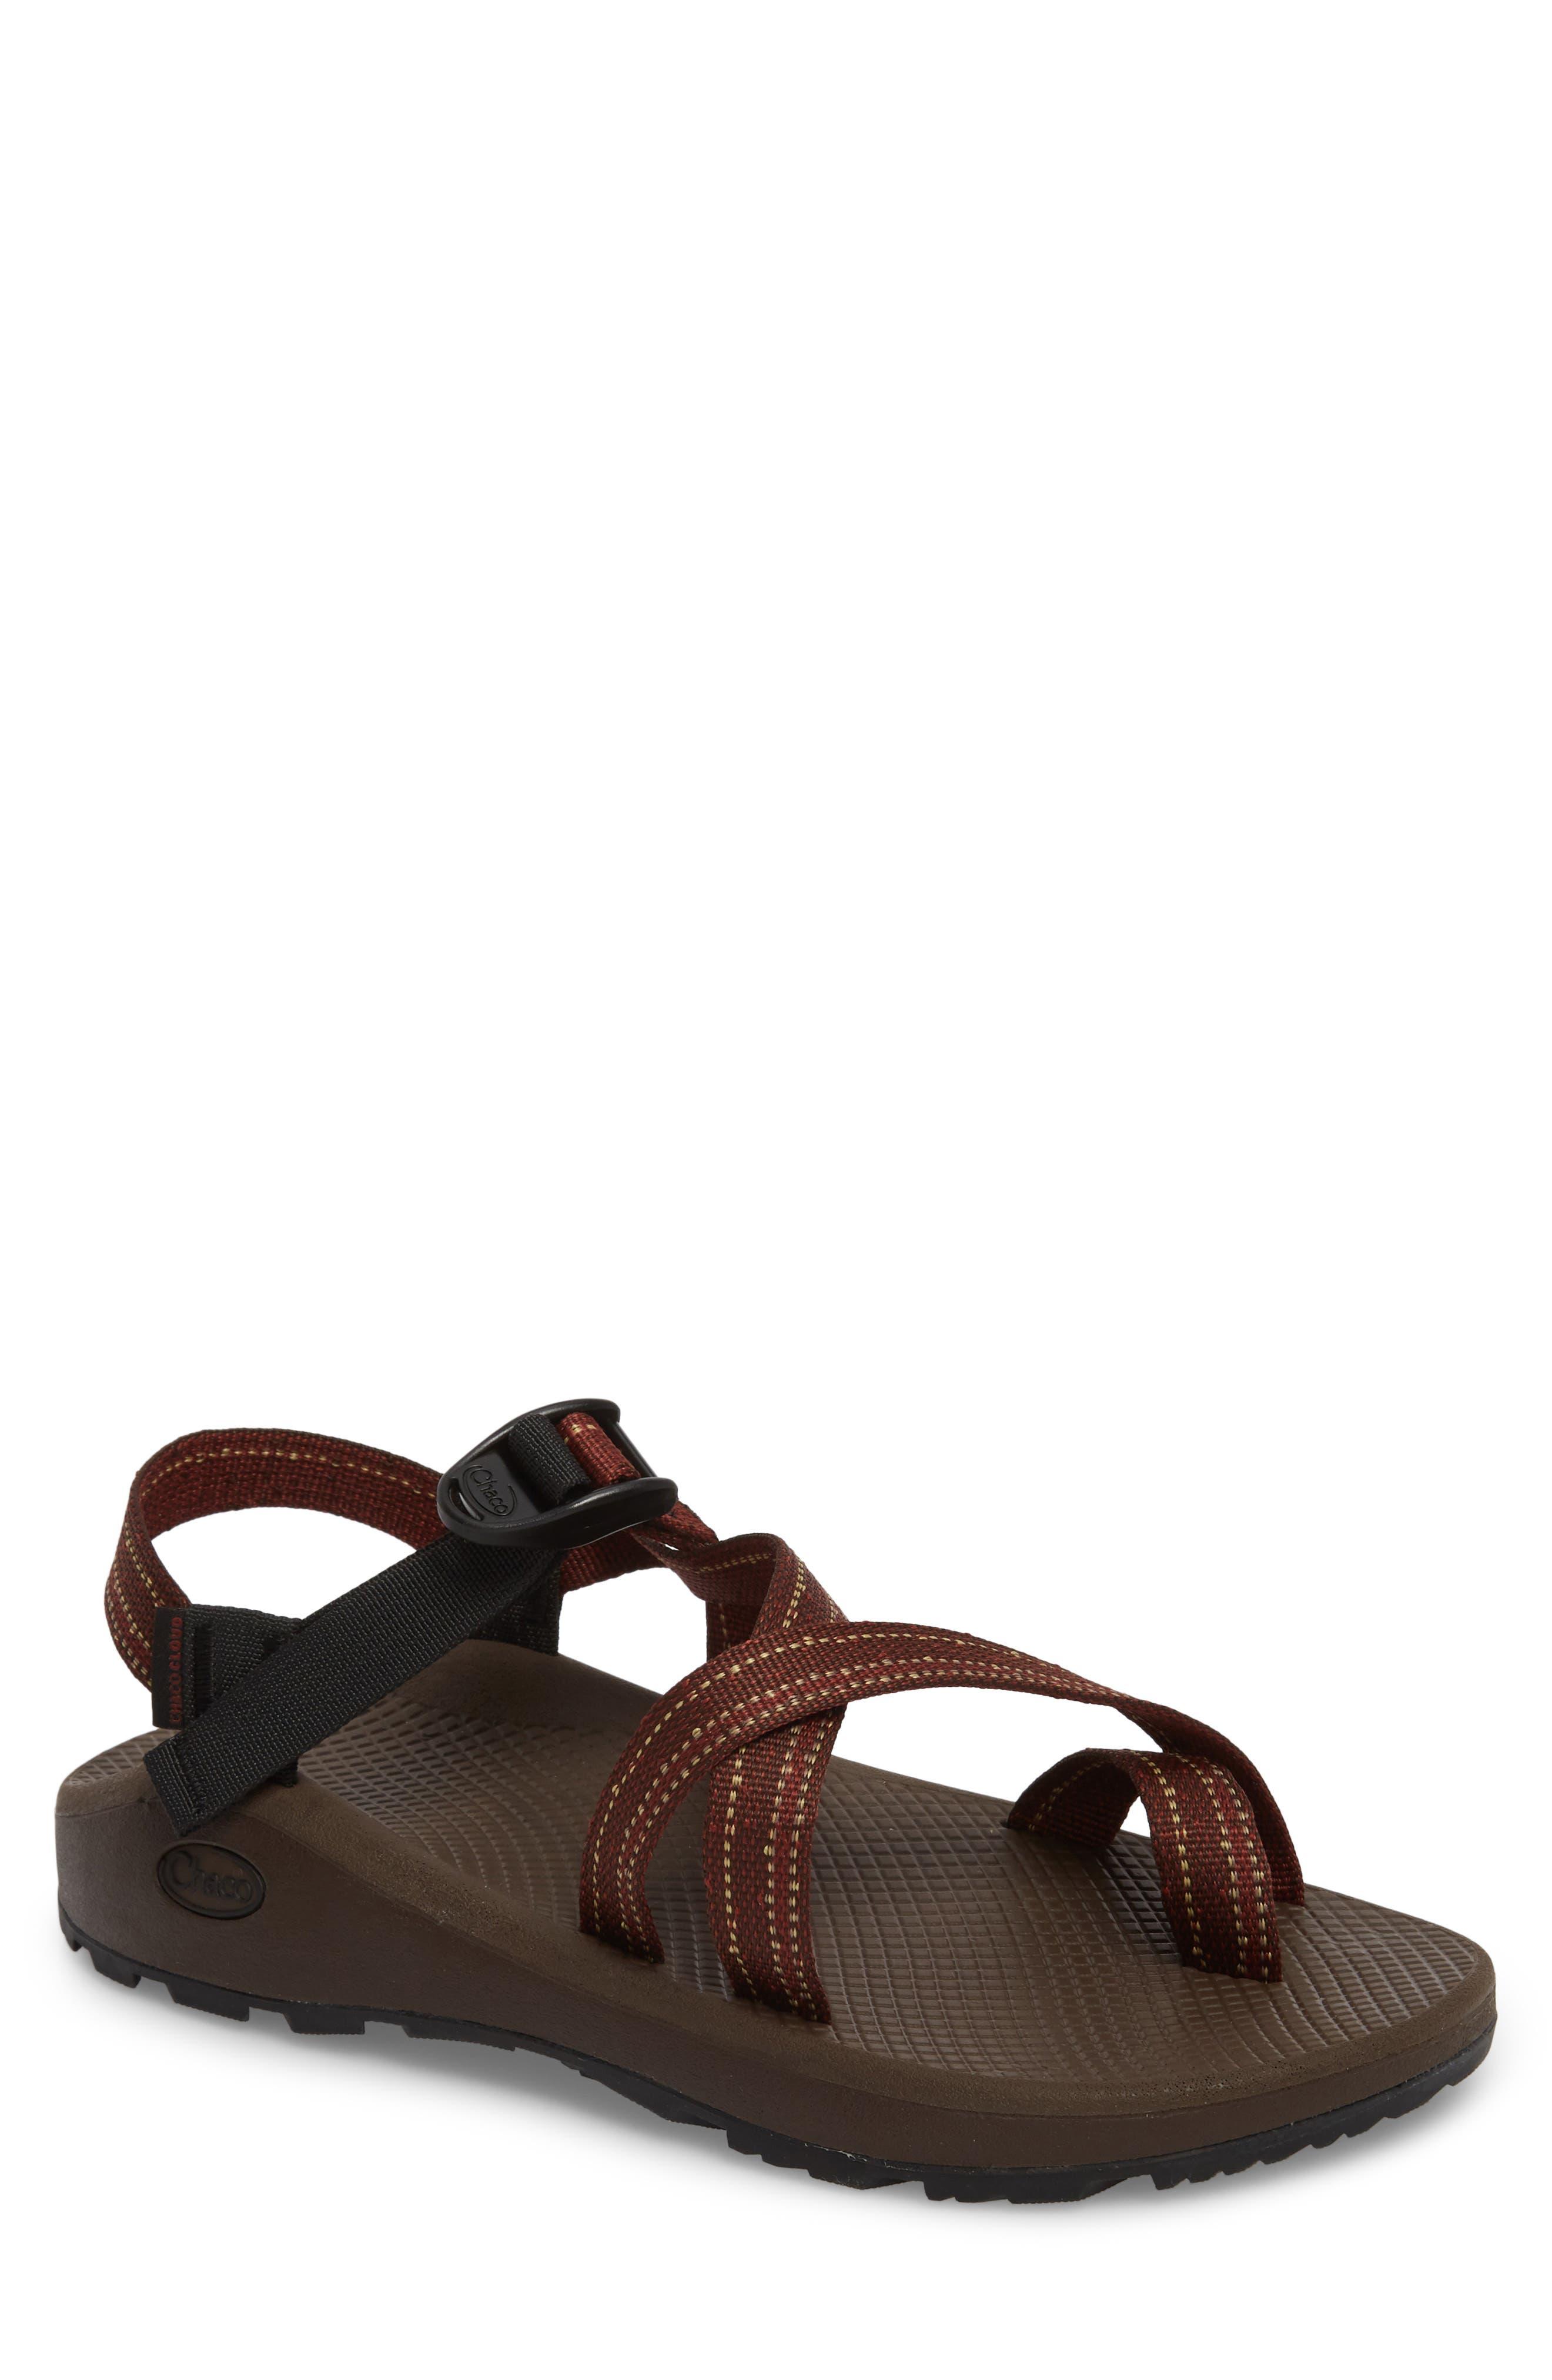 Z/Cloud 2 Sport Sandal,                             Main thumbnail 1, color,                             Seam Rust